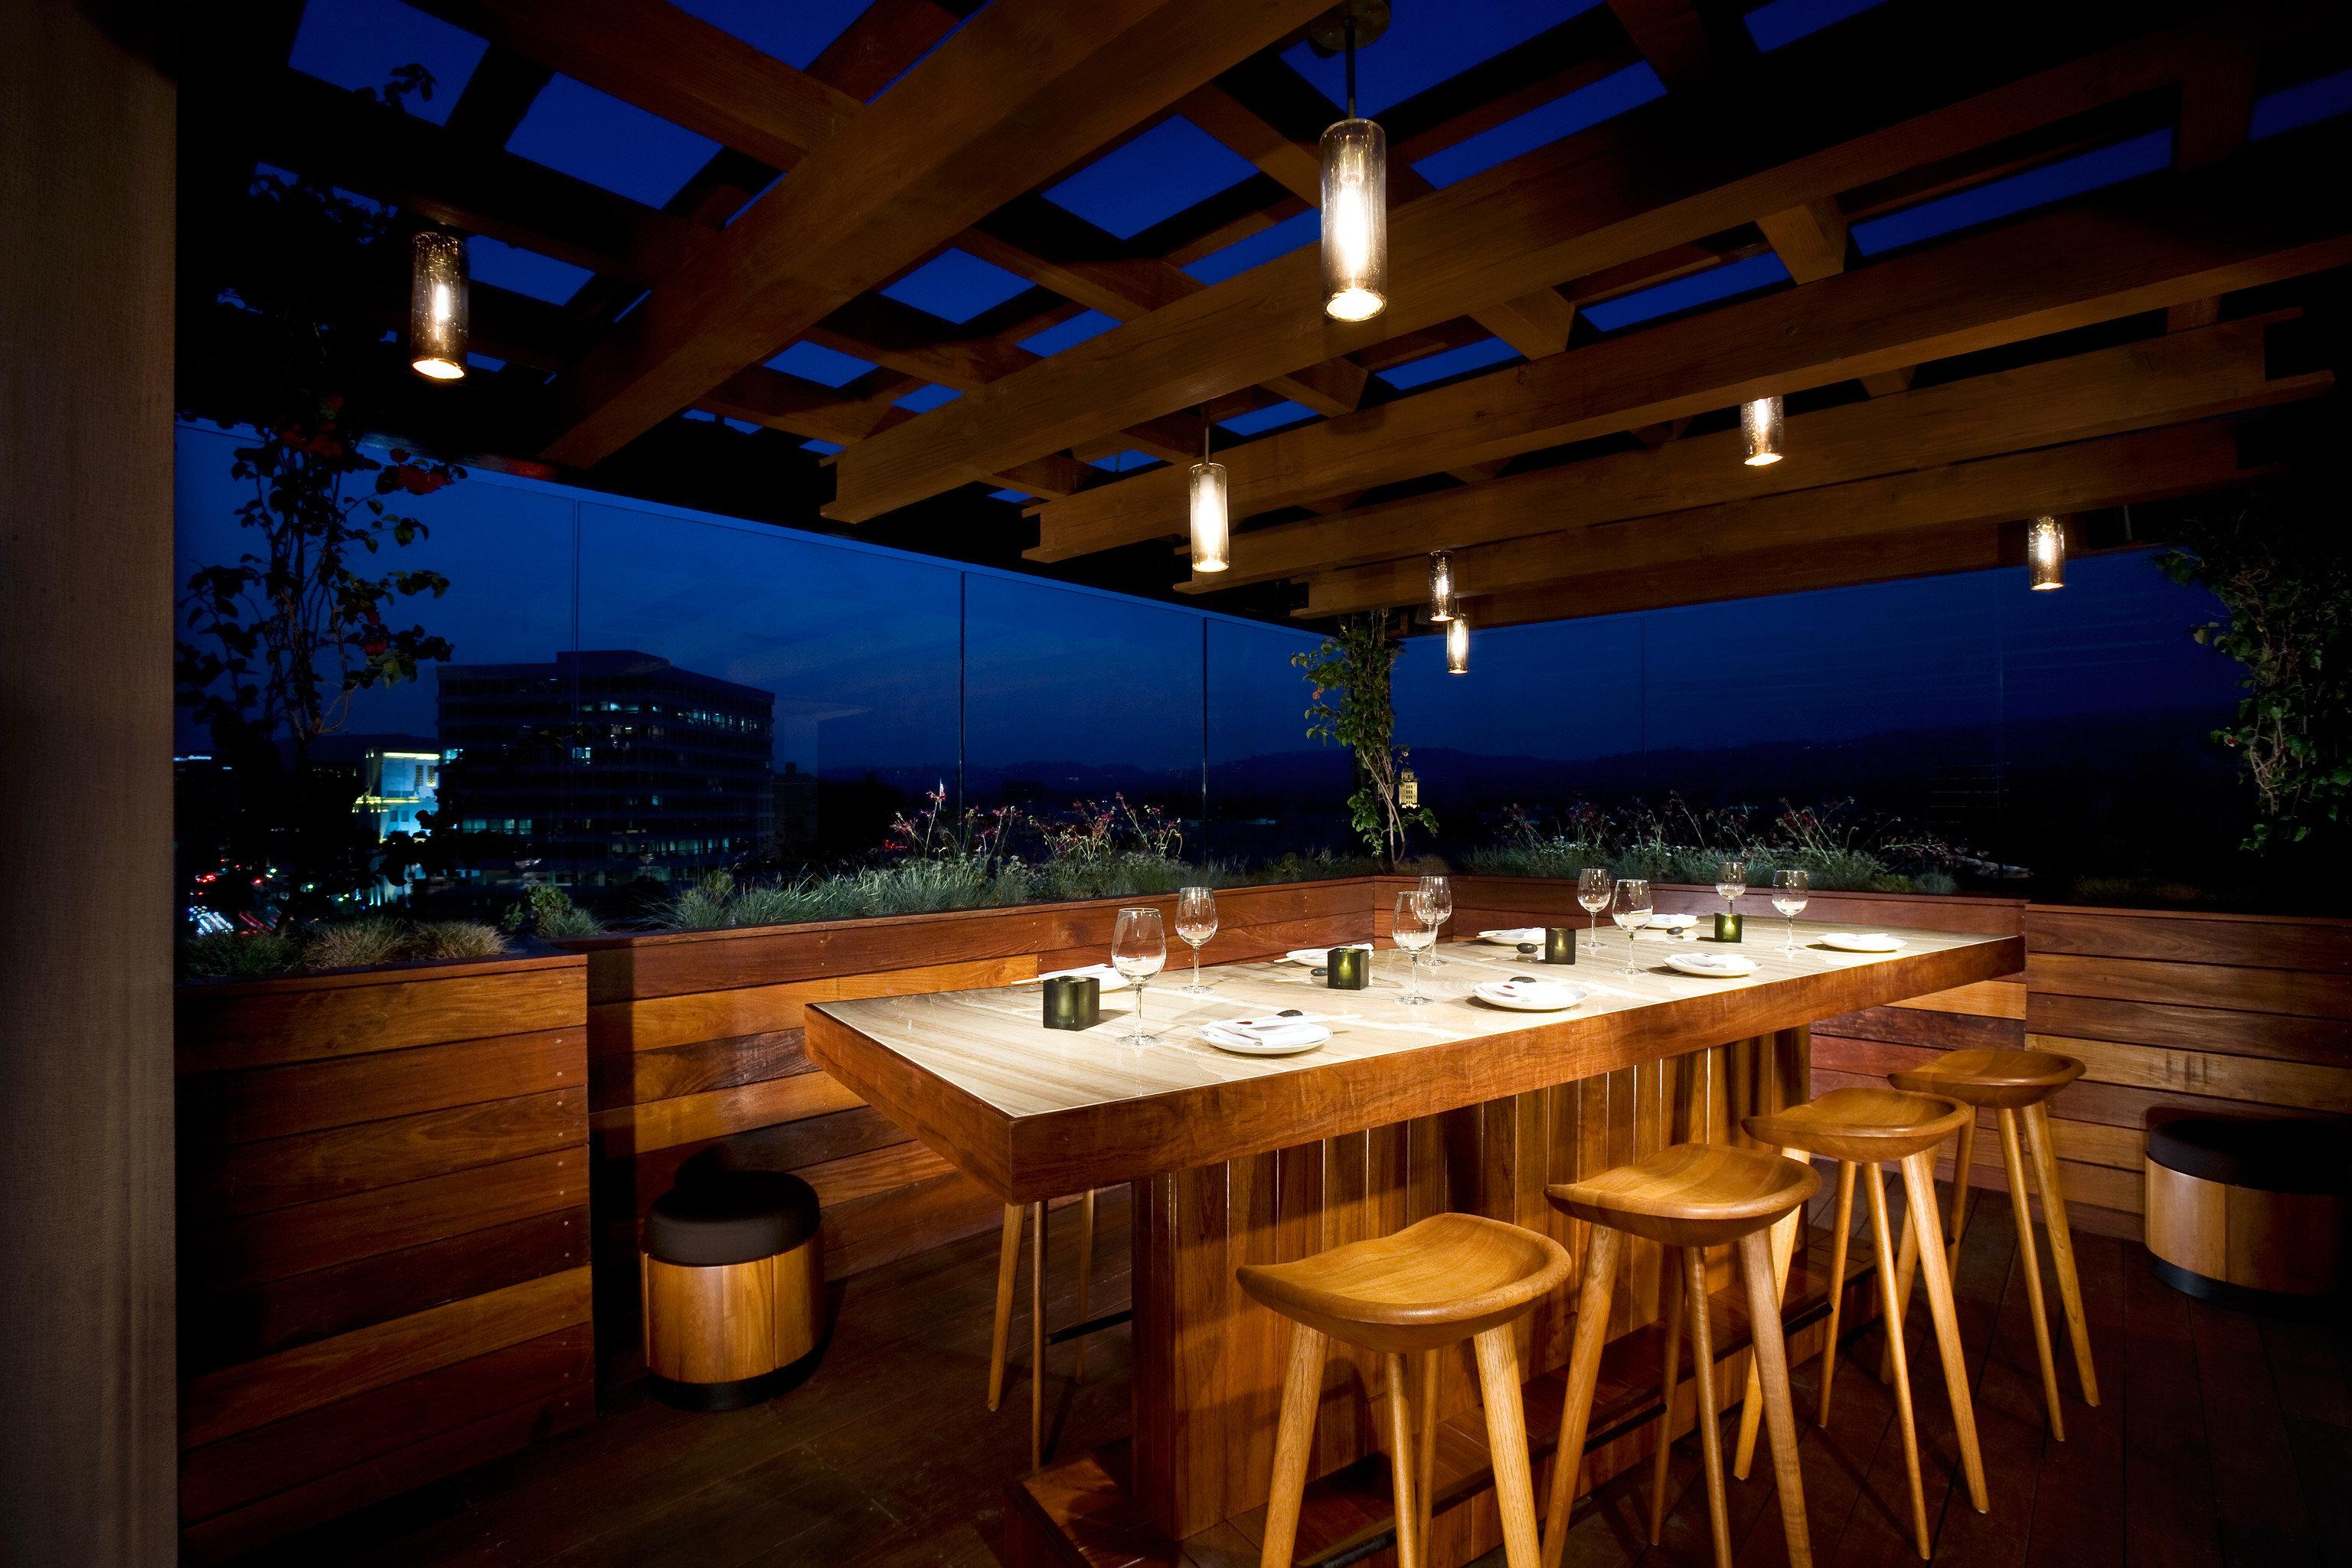 Drink Eat Hip Modern Nightlife Party Scenic views restaurant lighting Bar function hall Resort